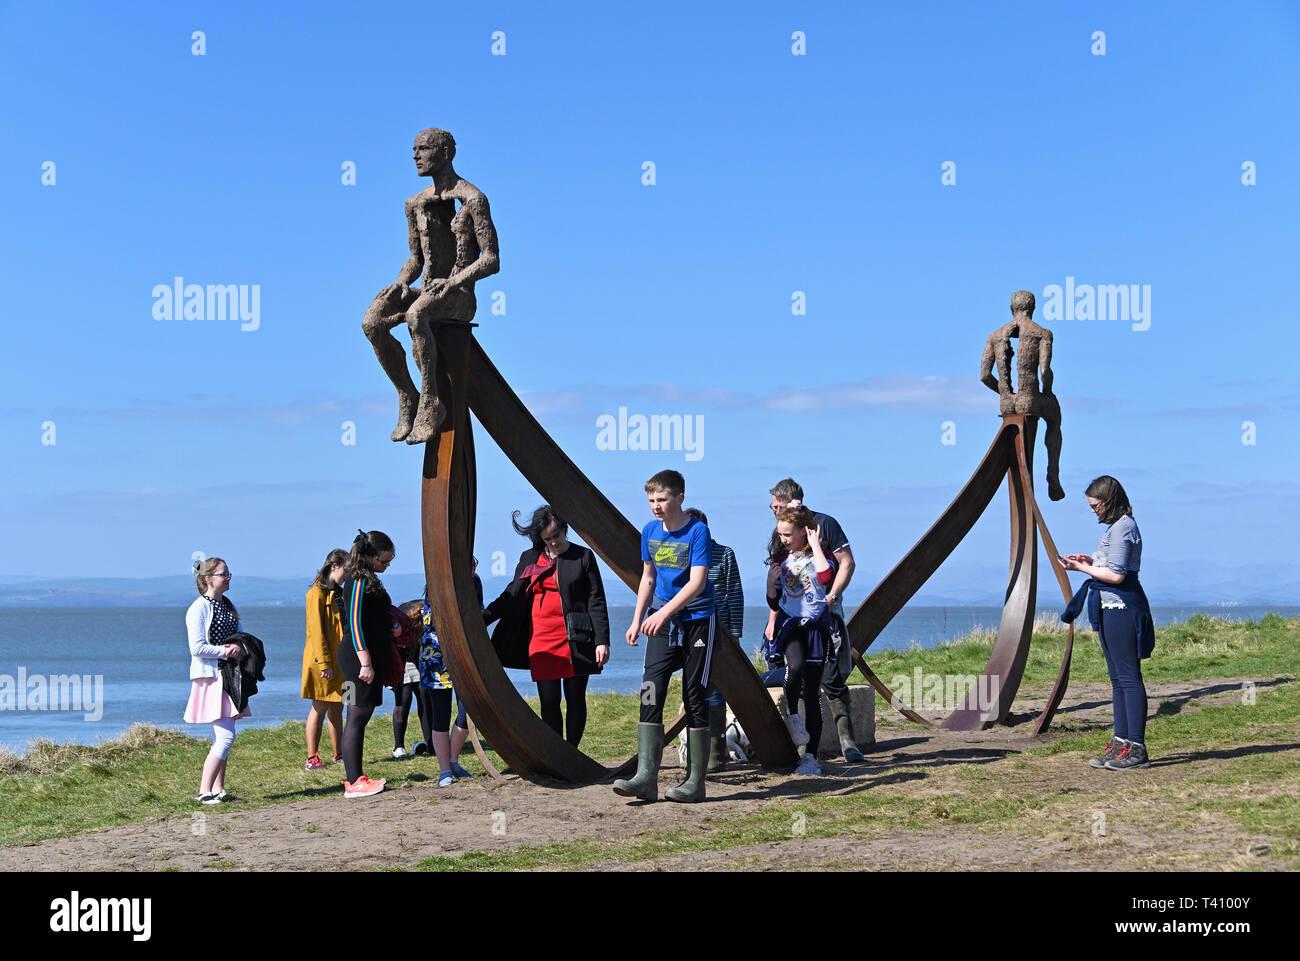 Party of children at 'Ship', metal sculpture by Anna Gillespie, 2019. Half Moon Bay, Heysham, Lancashire, England, United Kingdom, Europe. - Stock Image